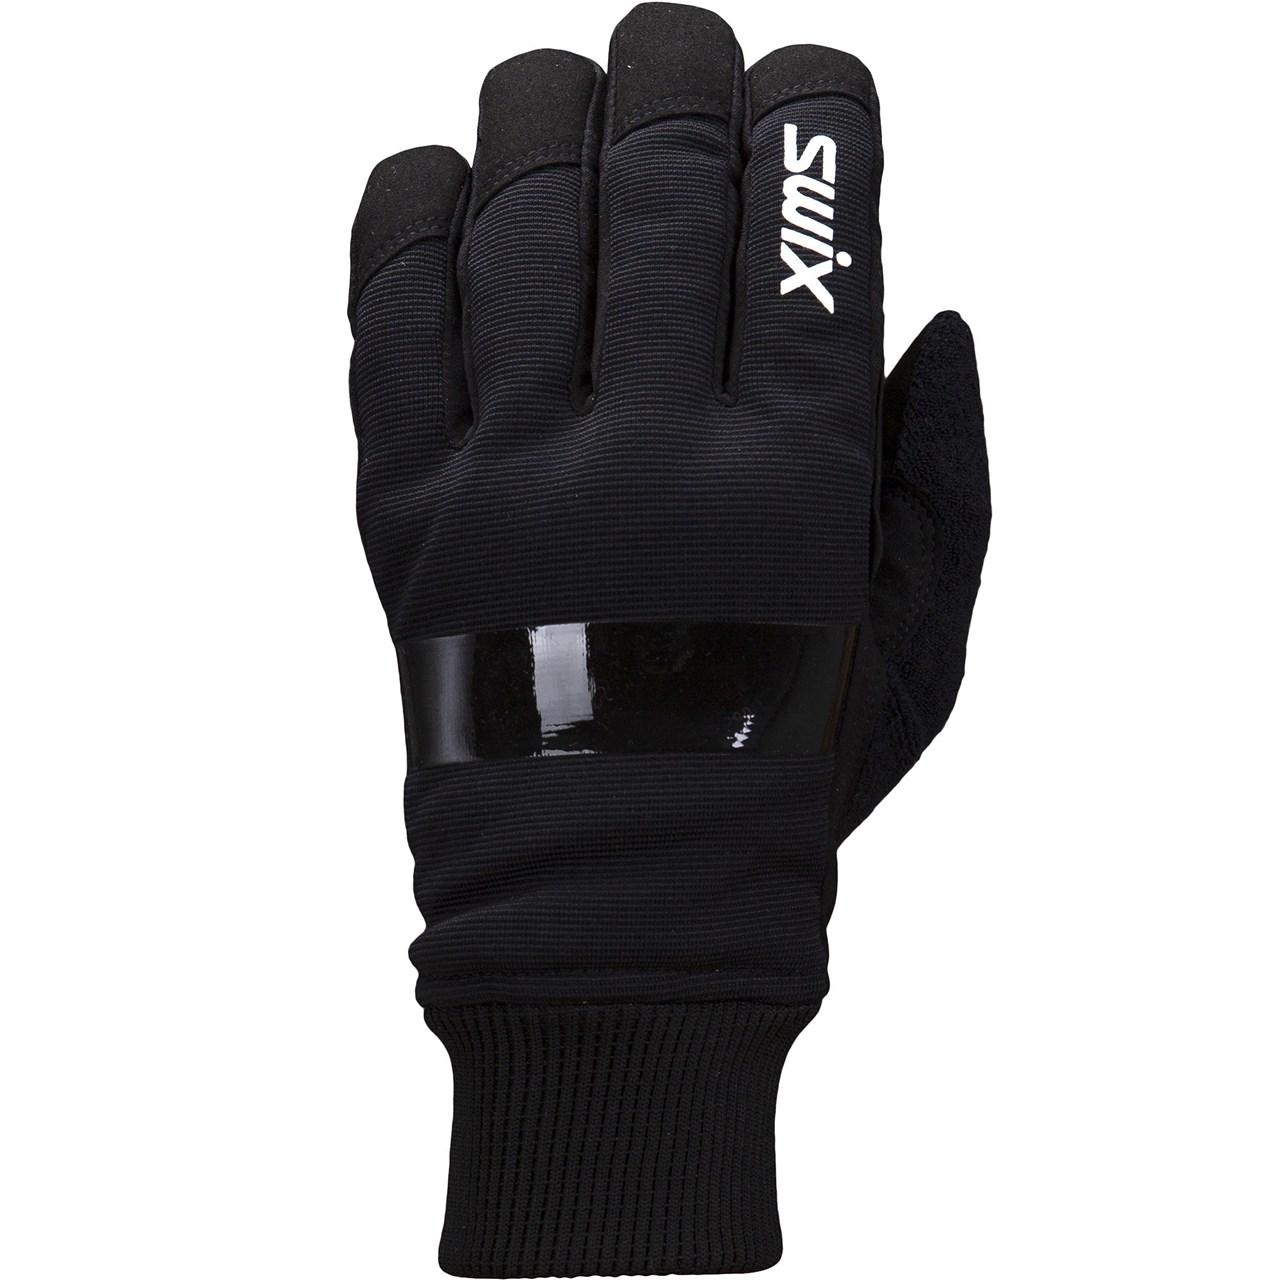 Endure glove